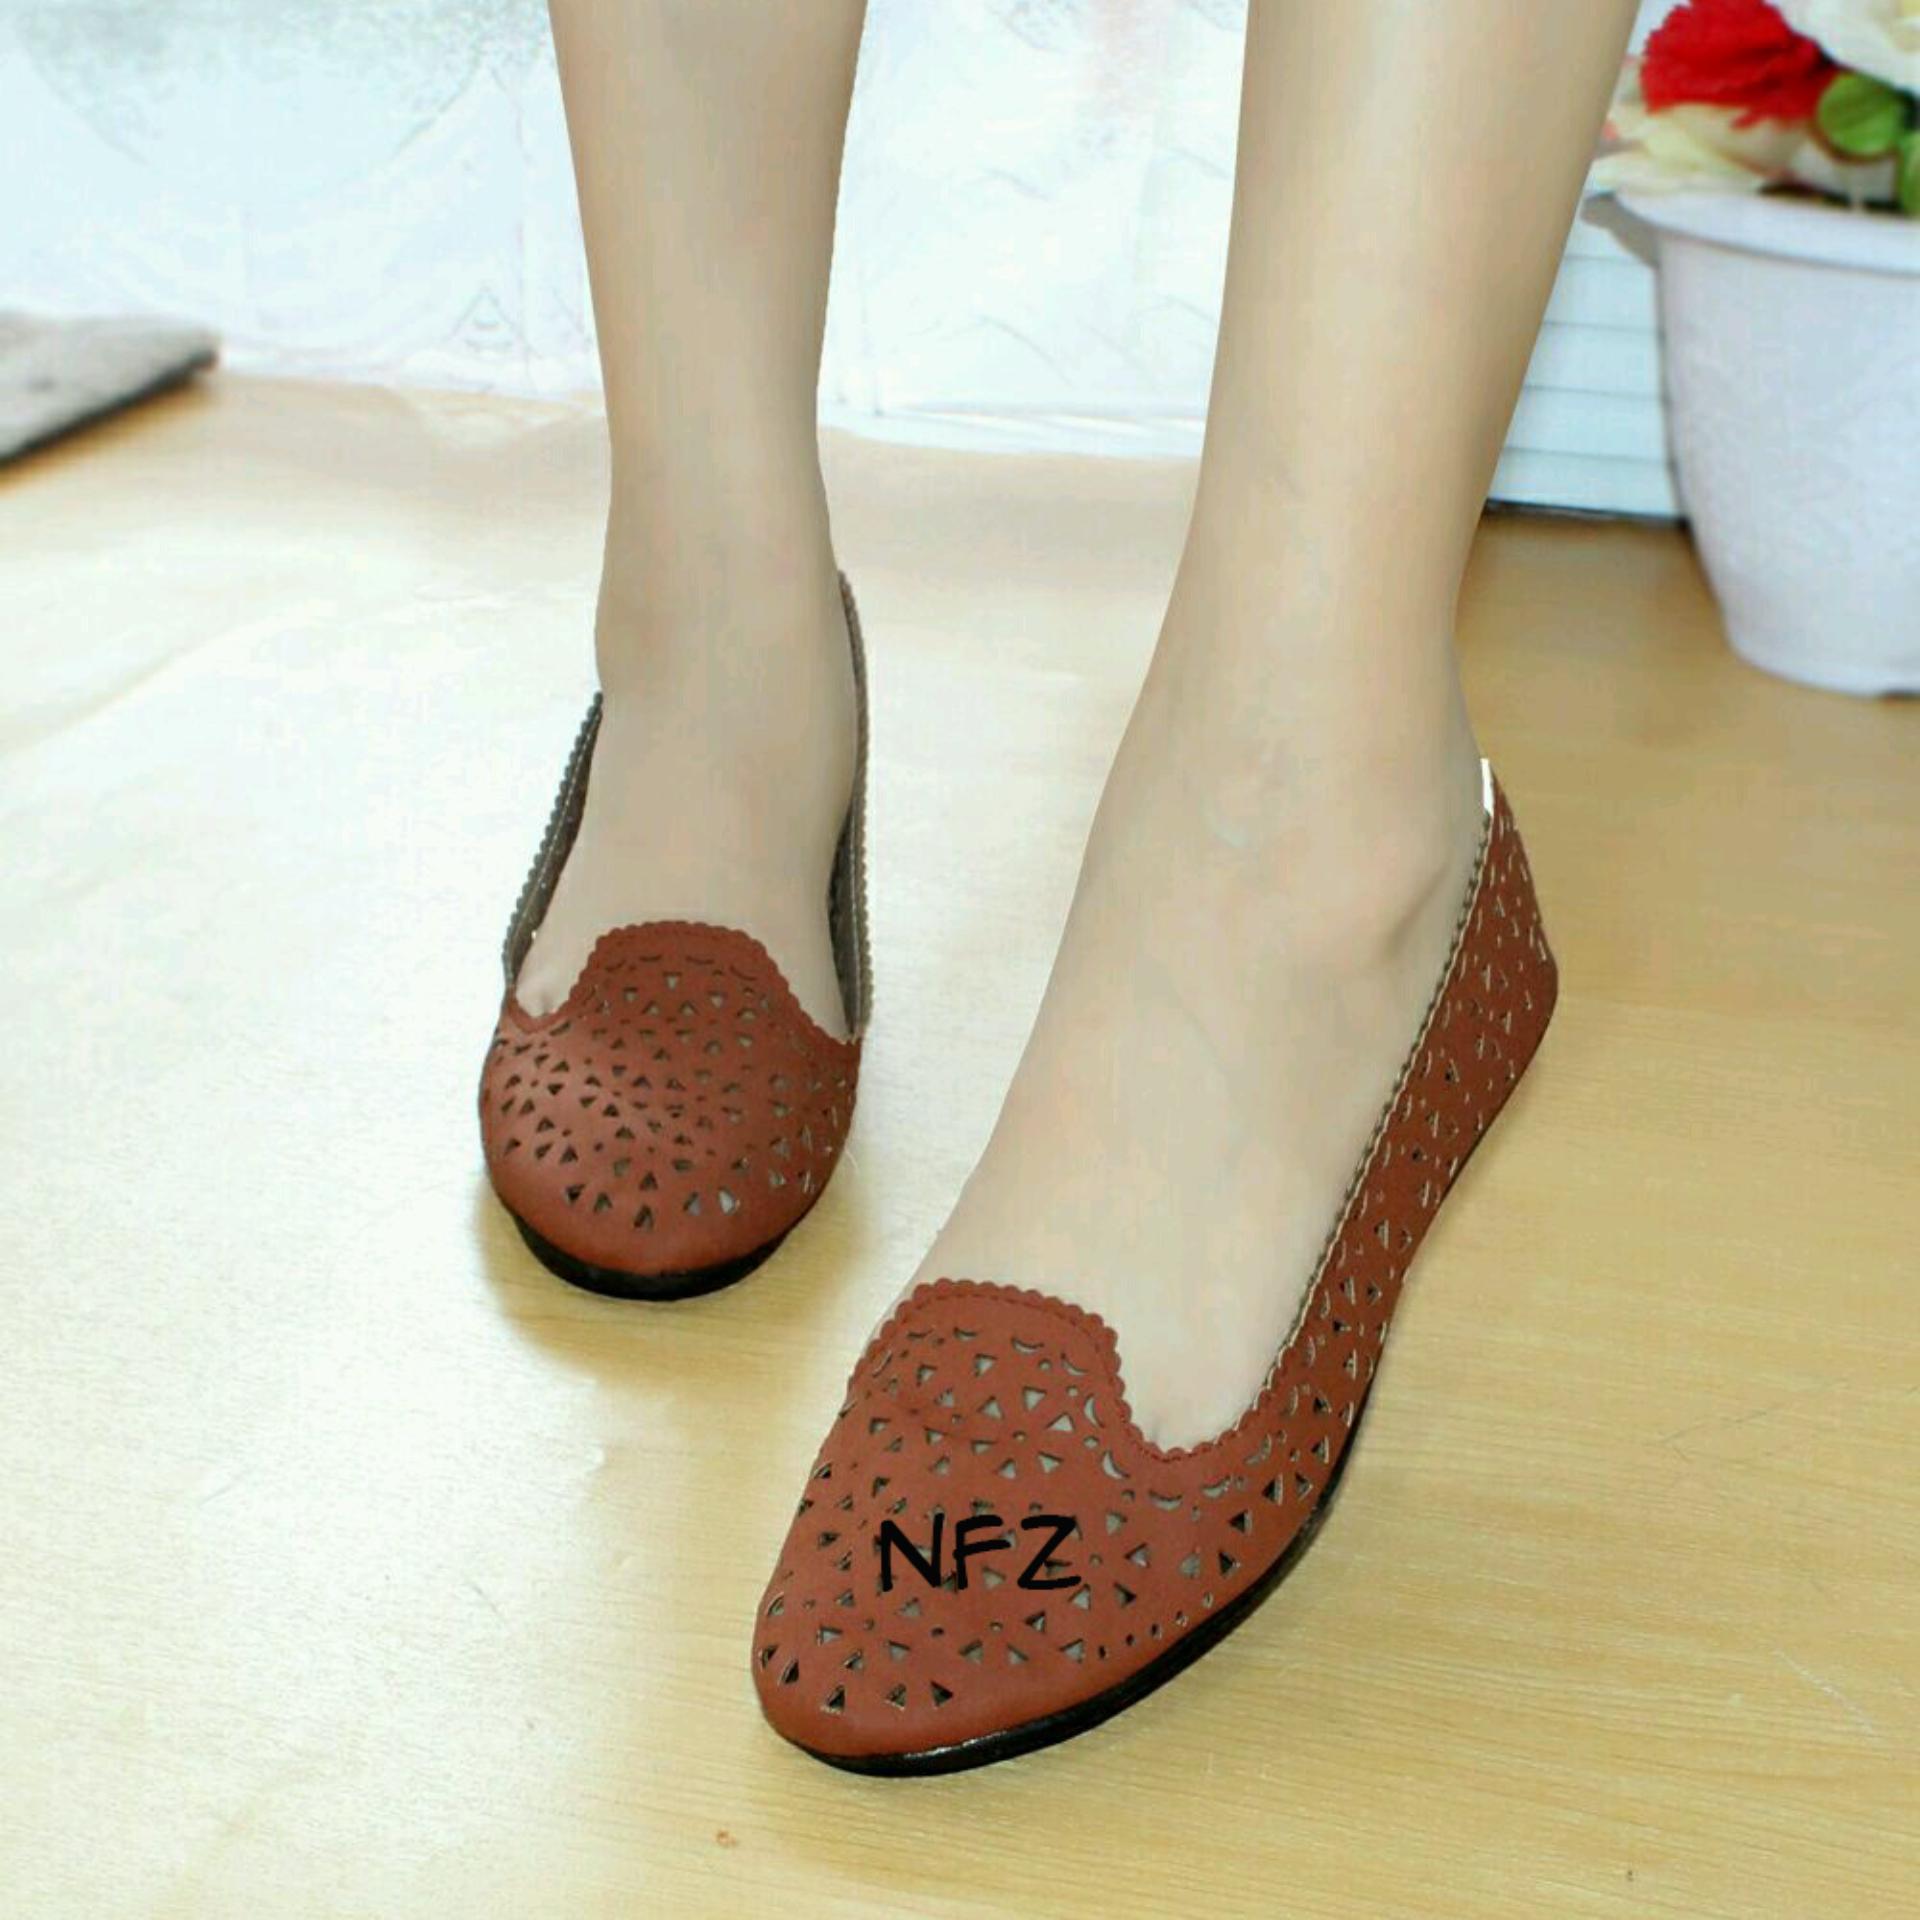 Beli Gratica Sepatu Flat Flatshoes Laser Brick Nfz 14 Terbaru